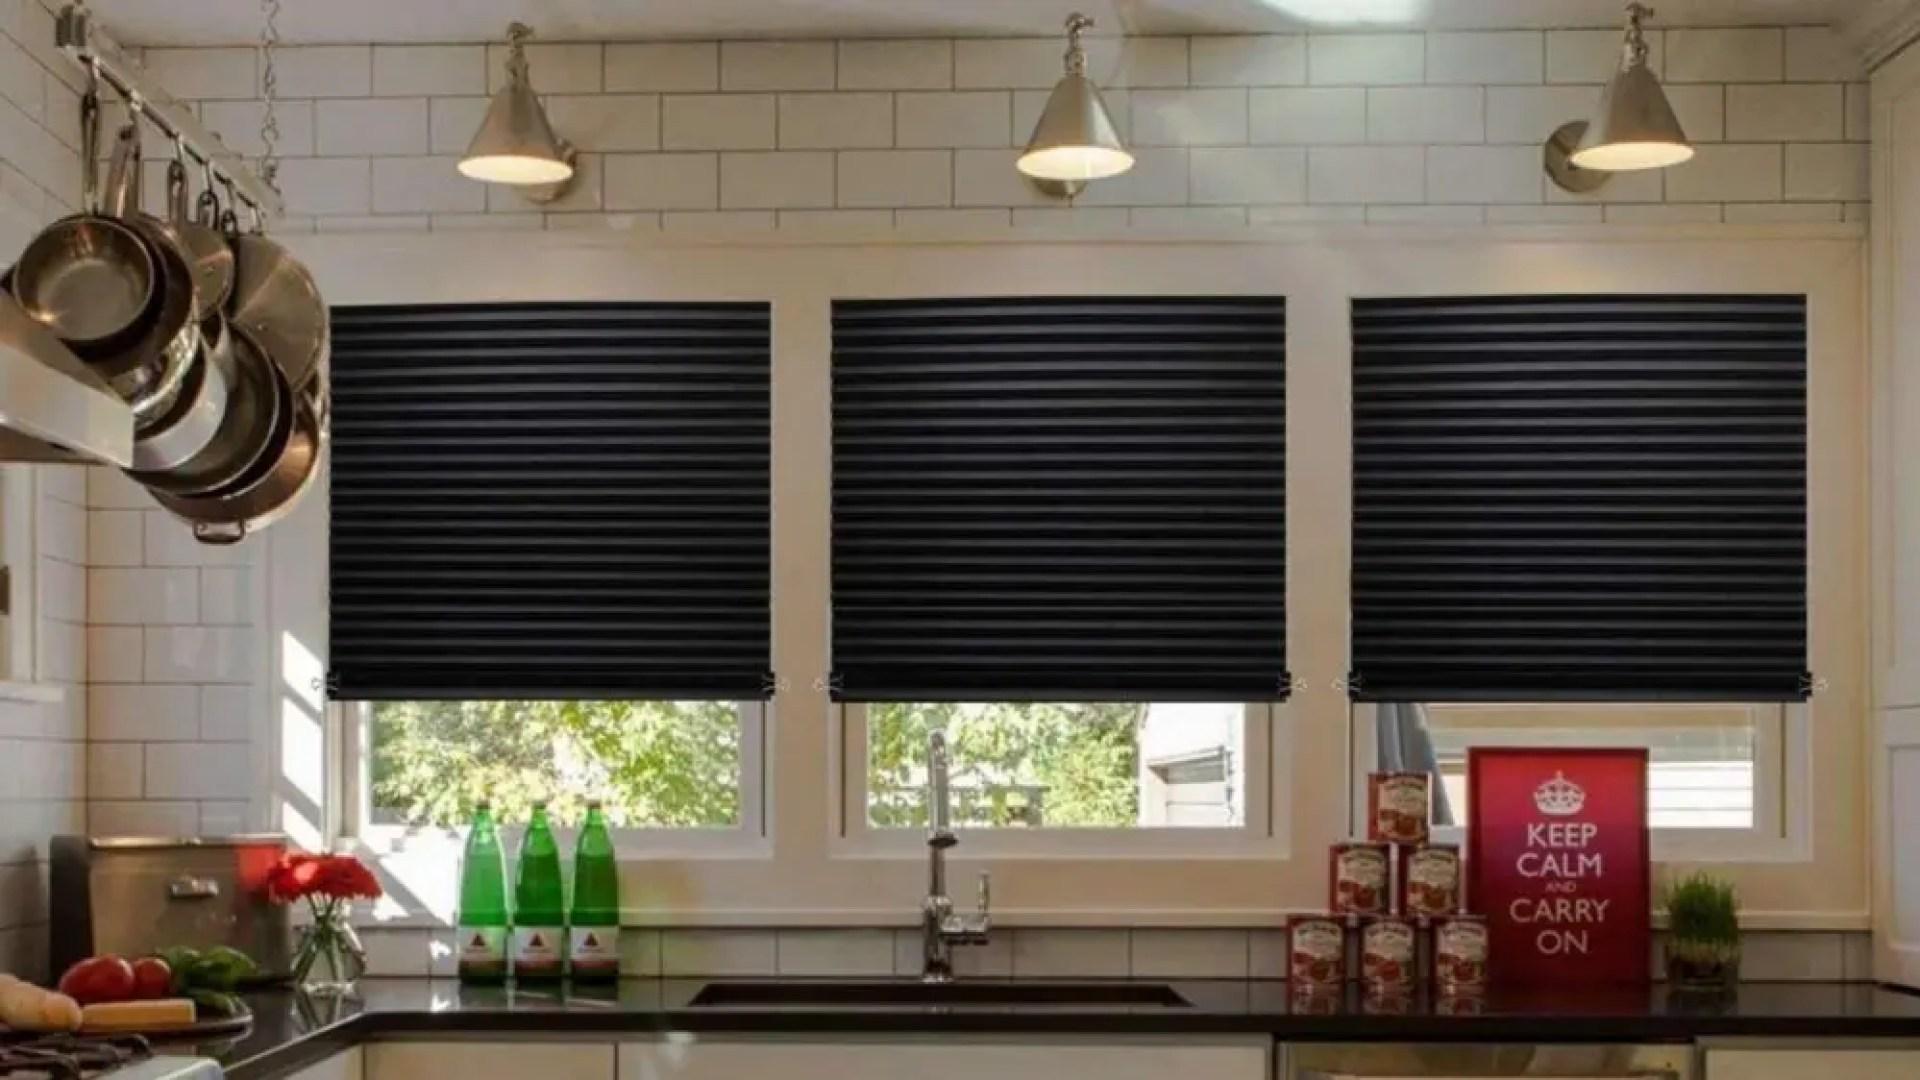 Three windows with black shades